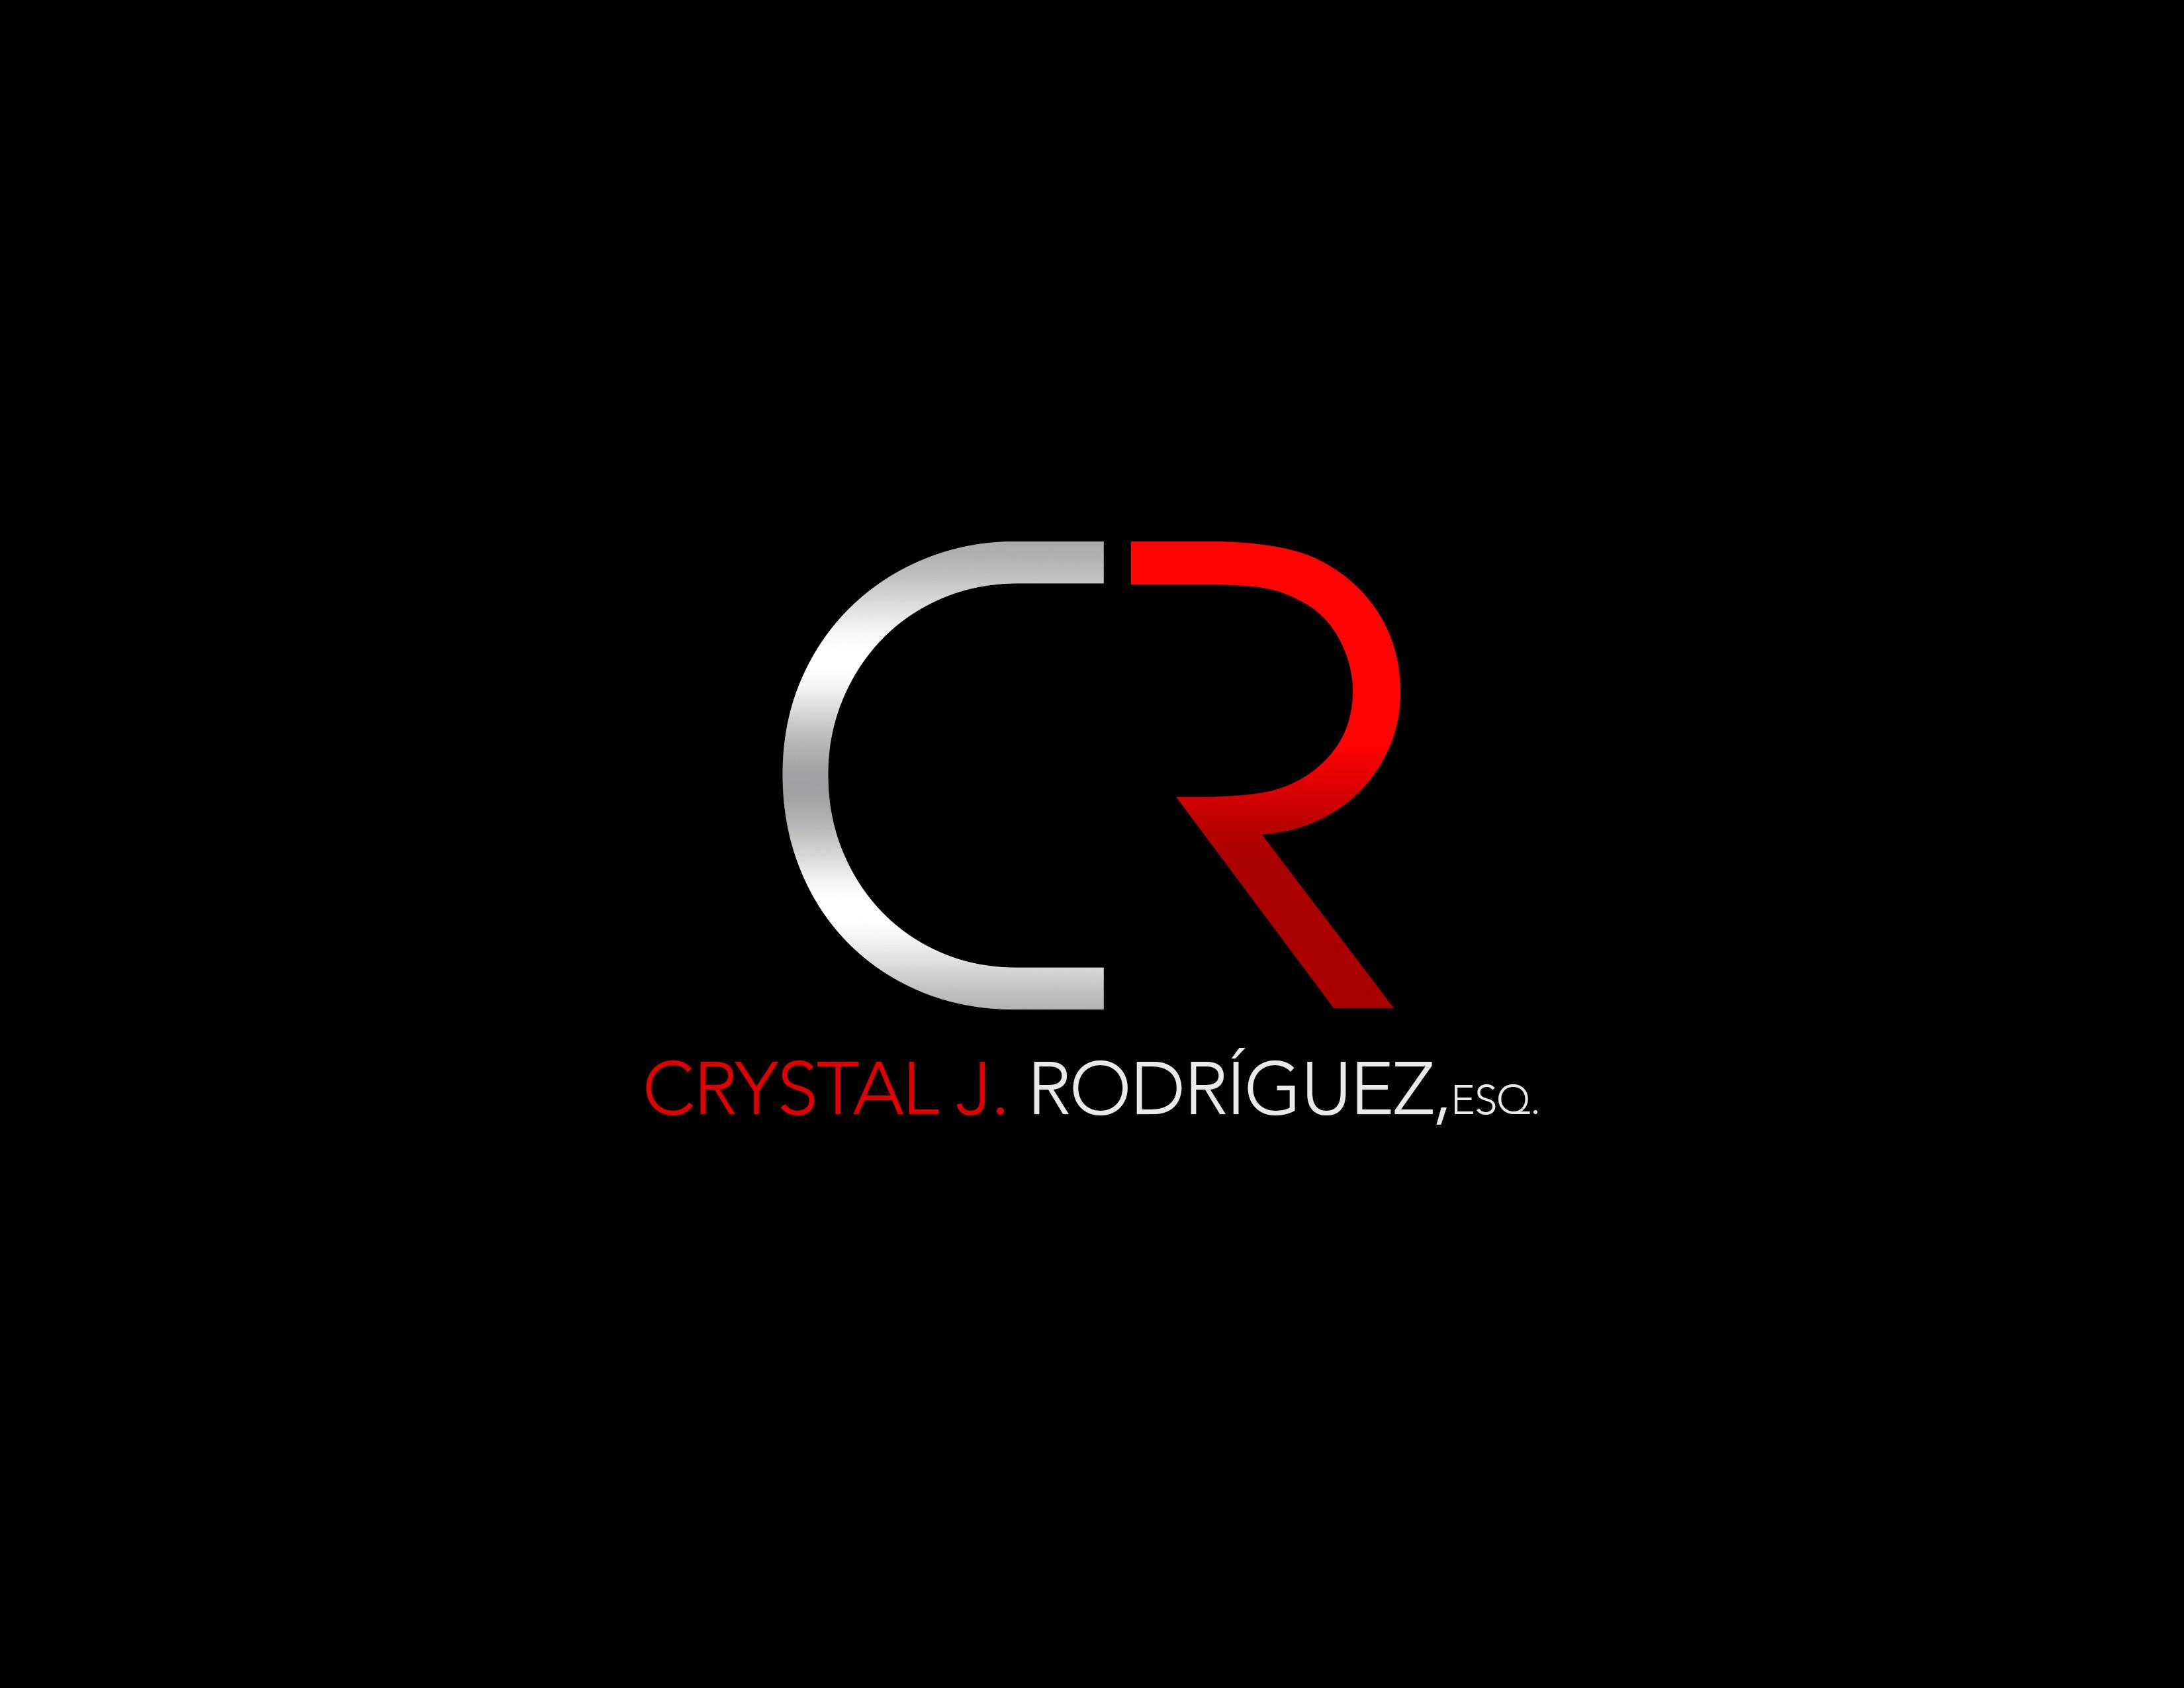 Crystal J. Rodriguez, Esq.